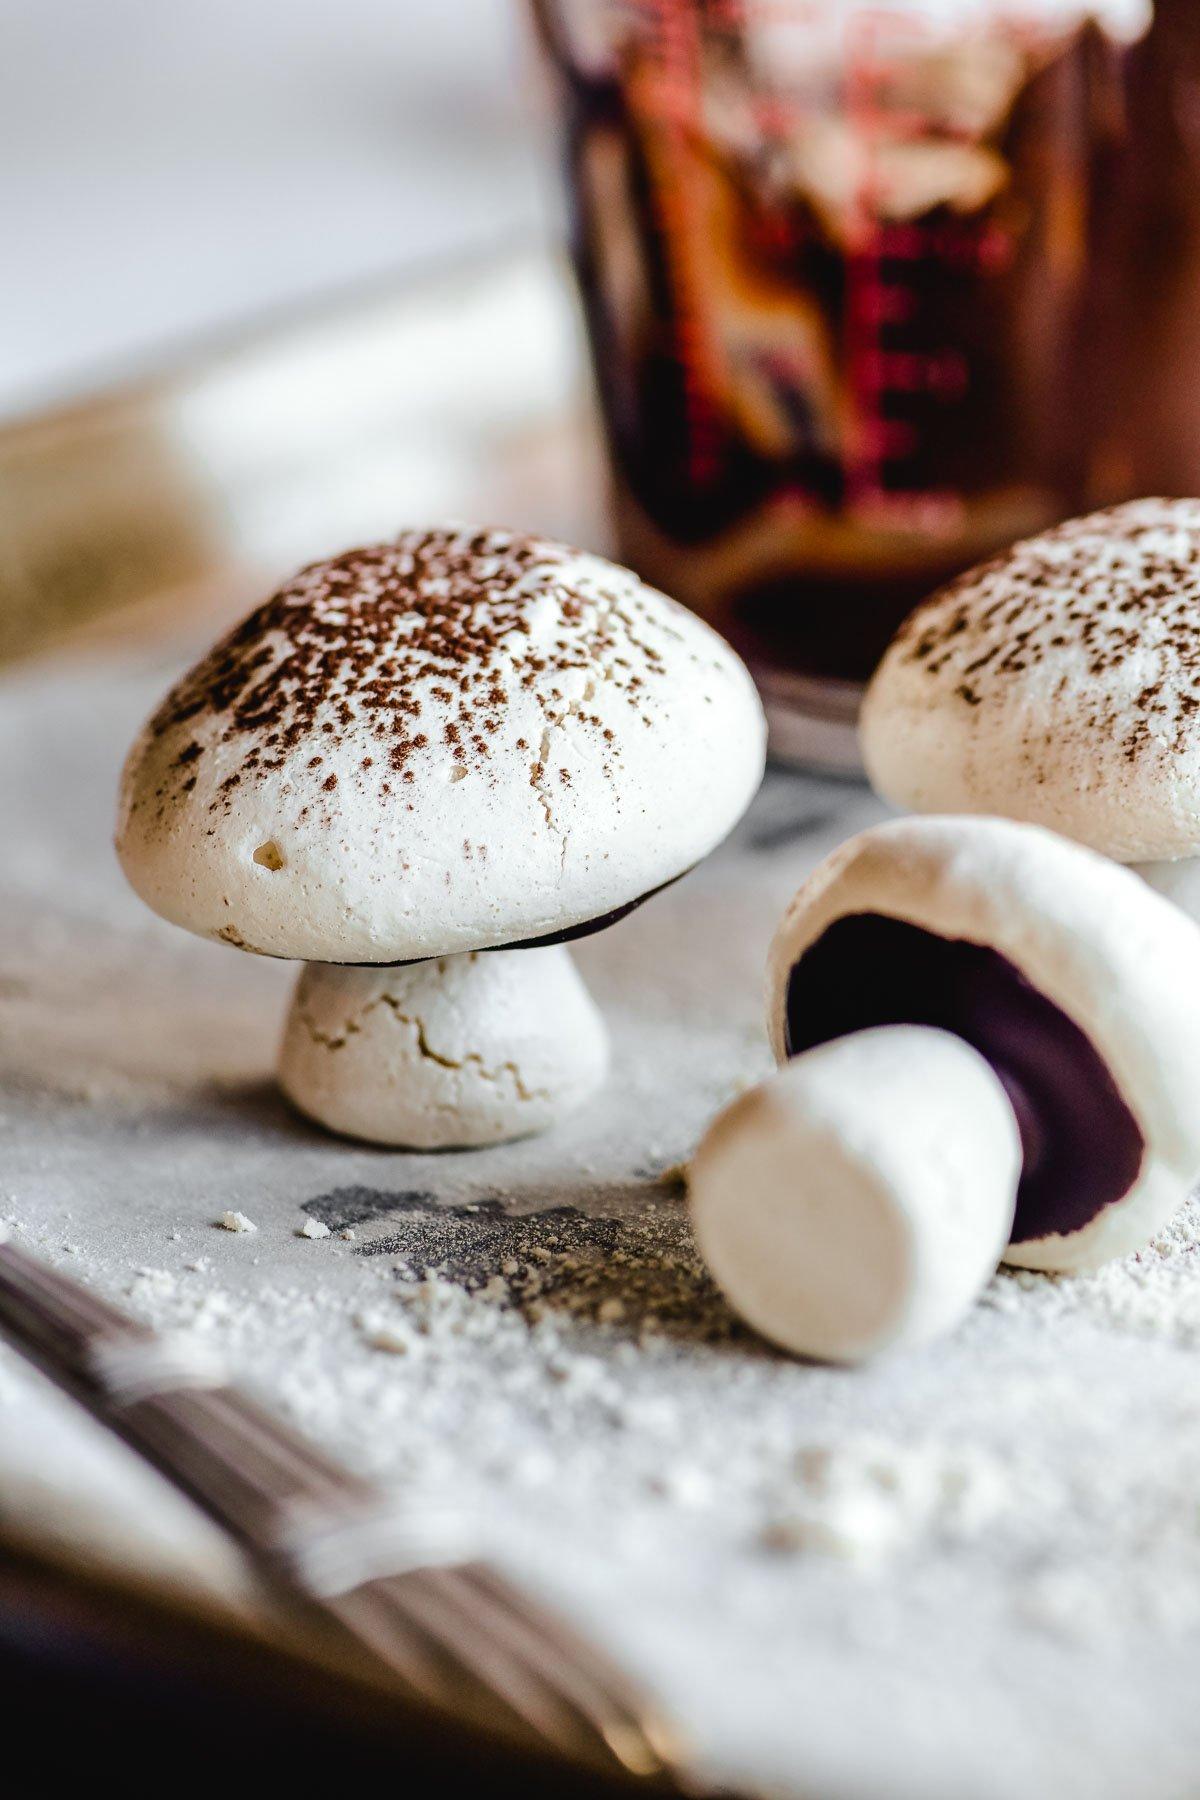 Homemade meringue mushrooms